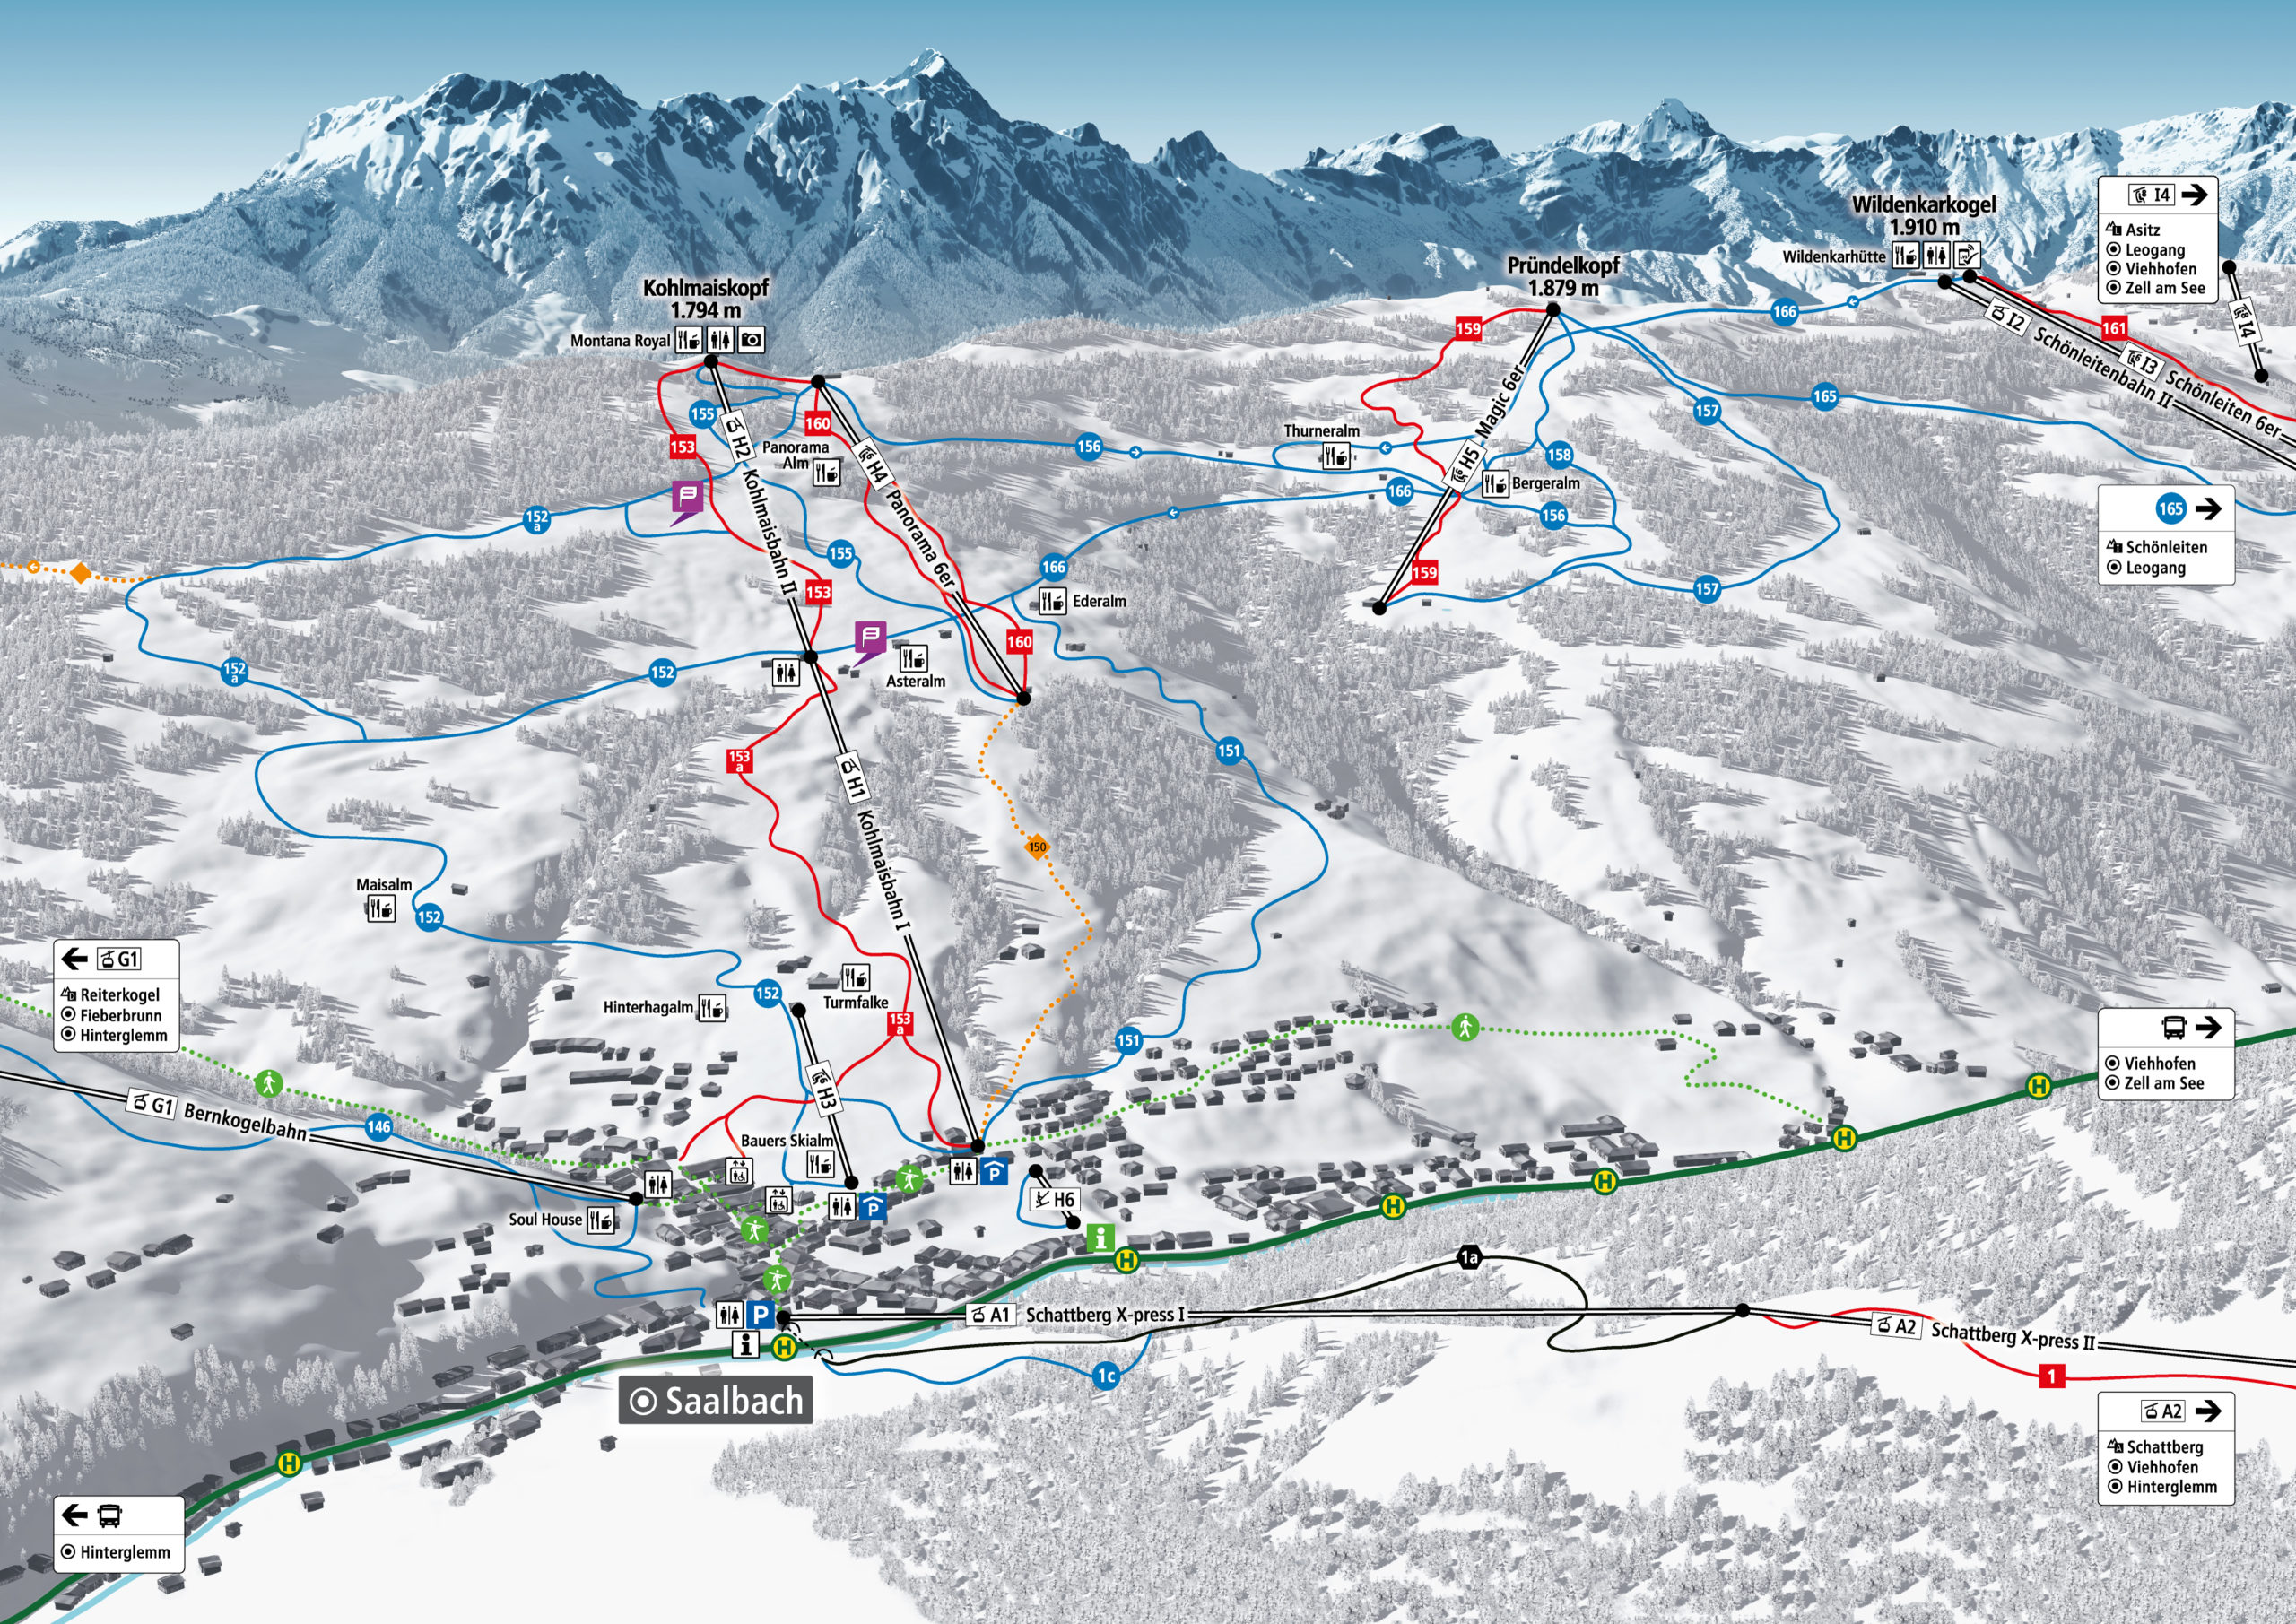 3D Pistenplan und Panoramakarte Skicircus Saalbach Hinterglemm Leogang Fieberbrunn Zone H Kohlmais